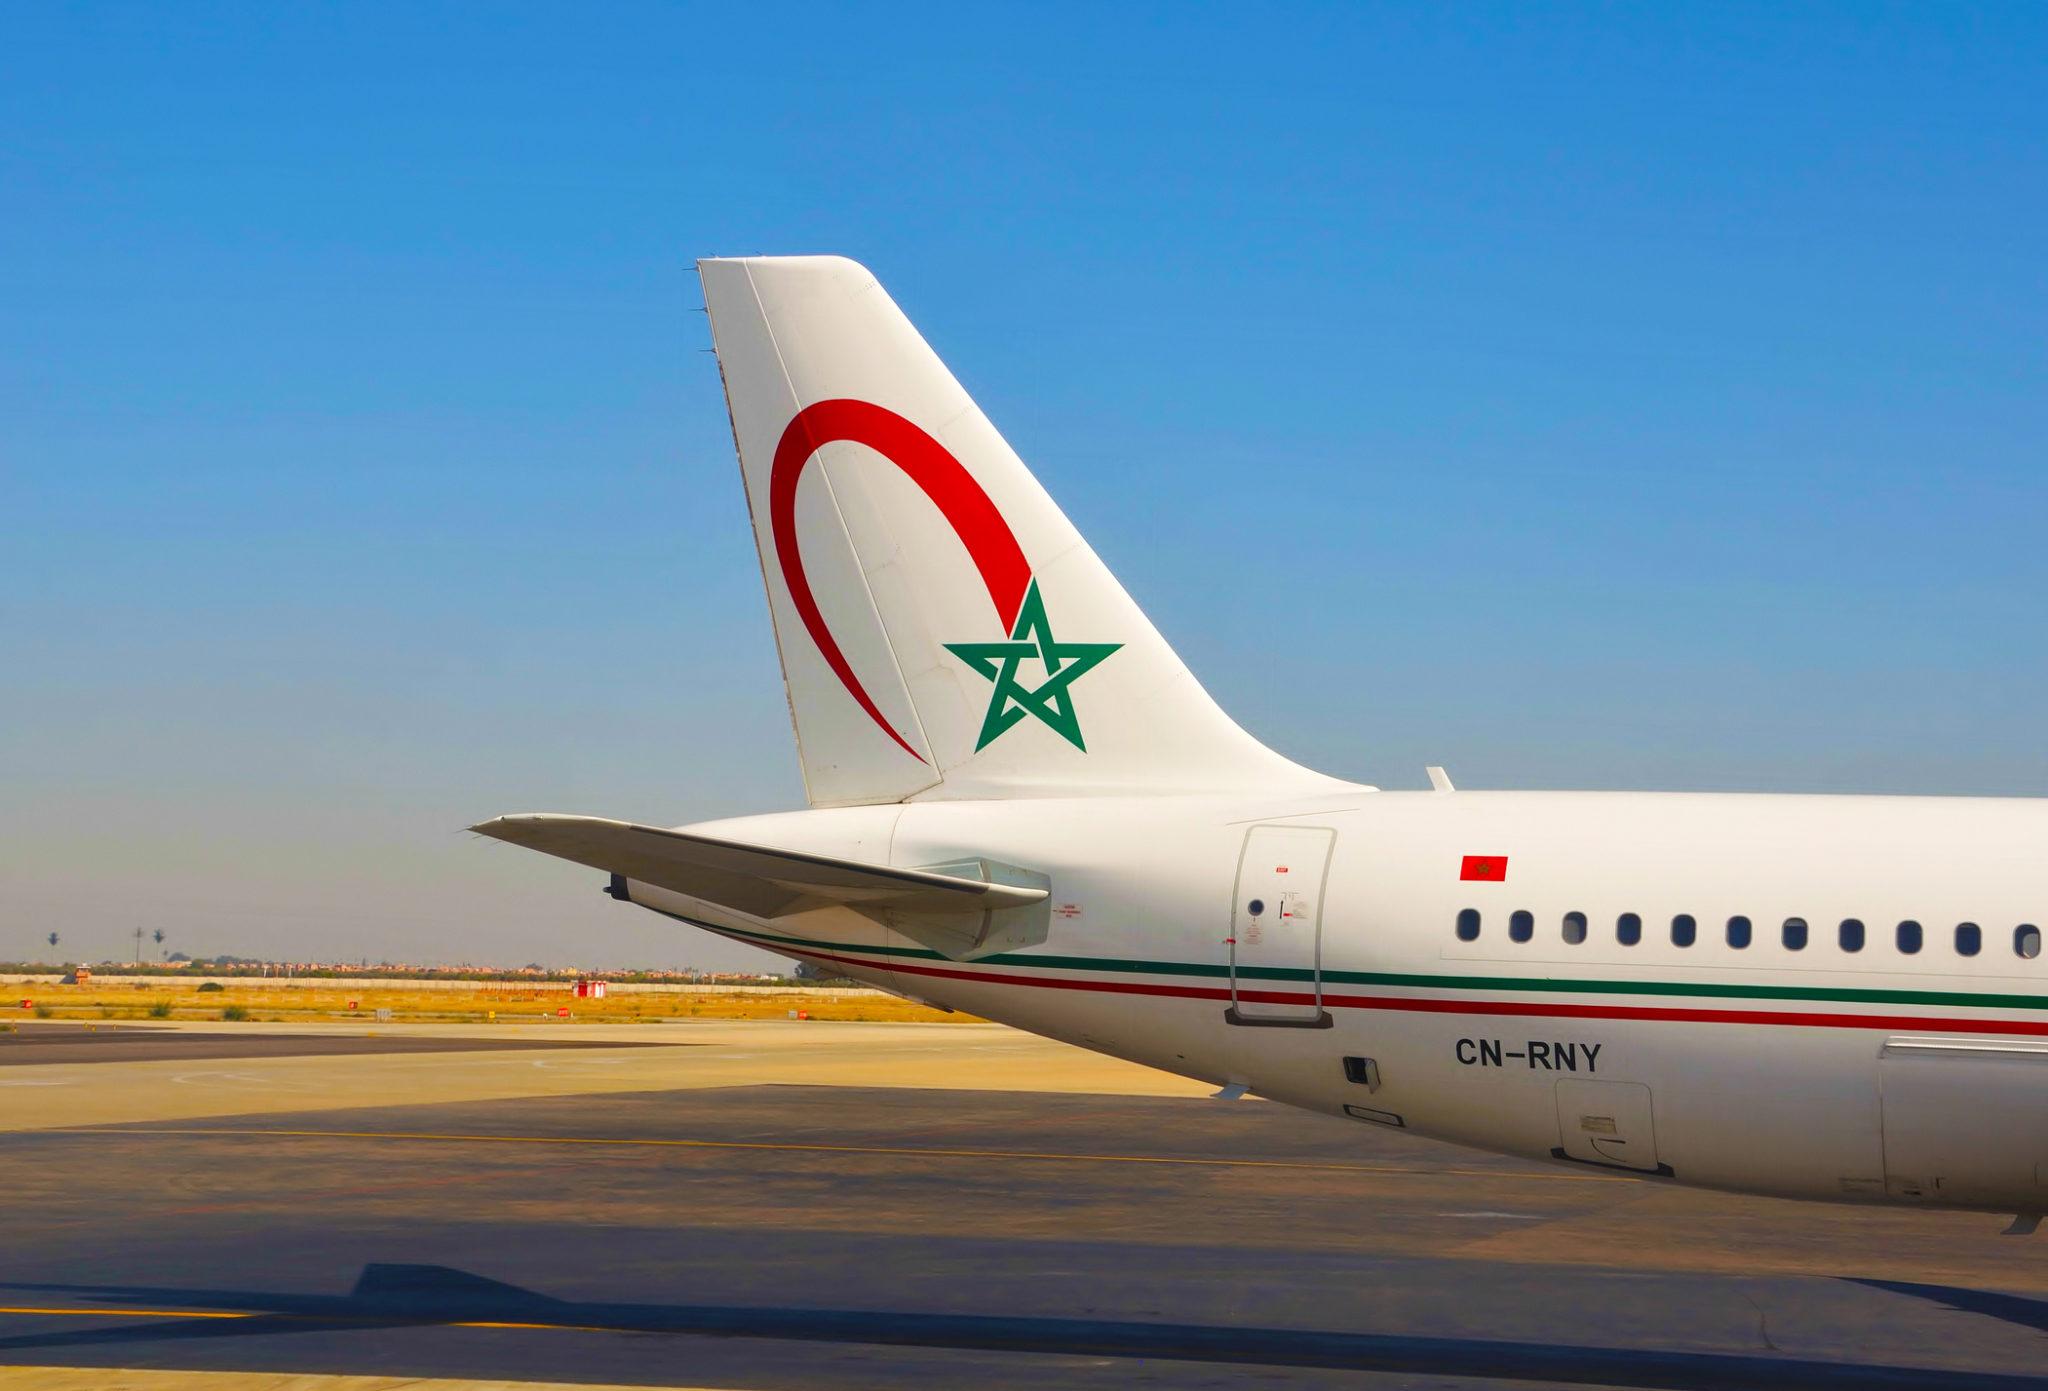 Letadlo Royal Air Maroc